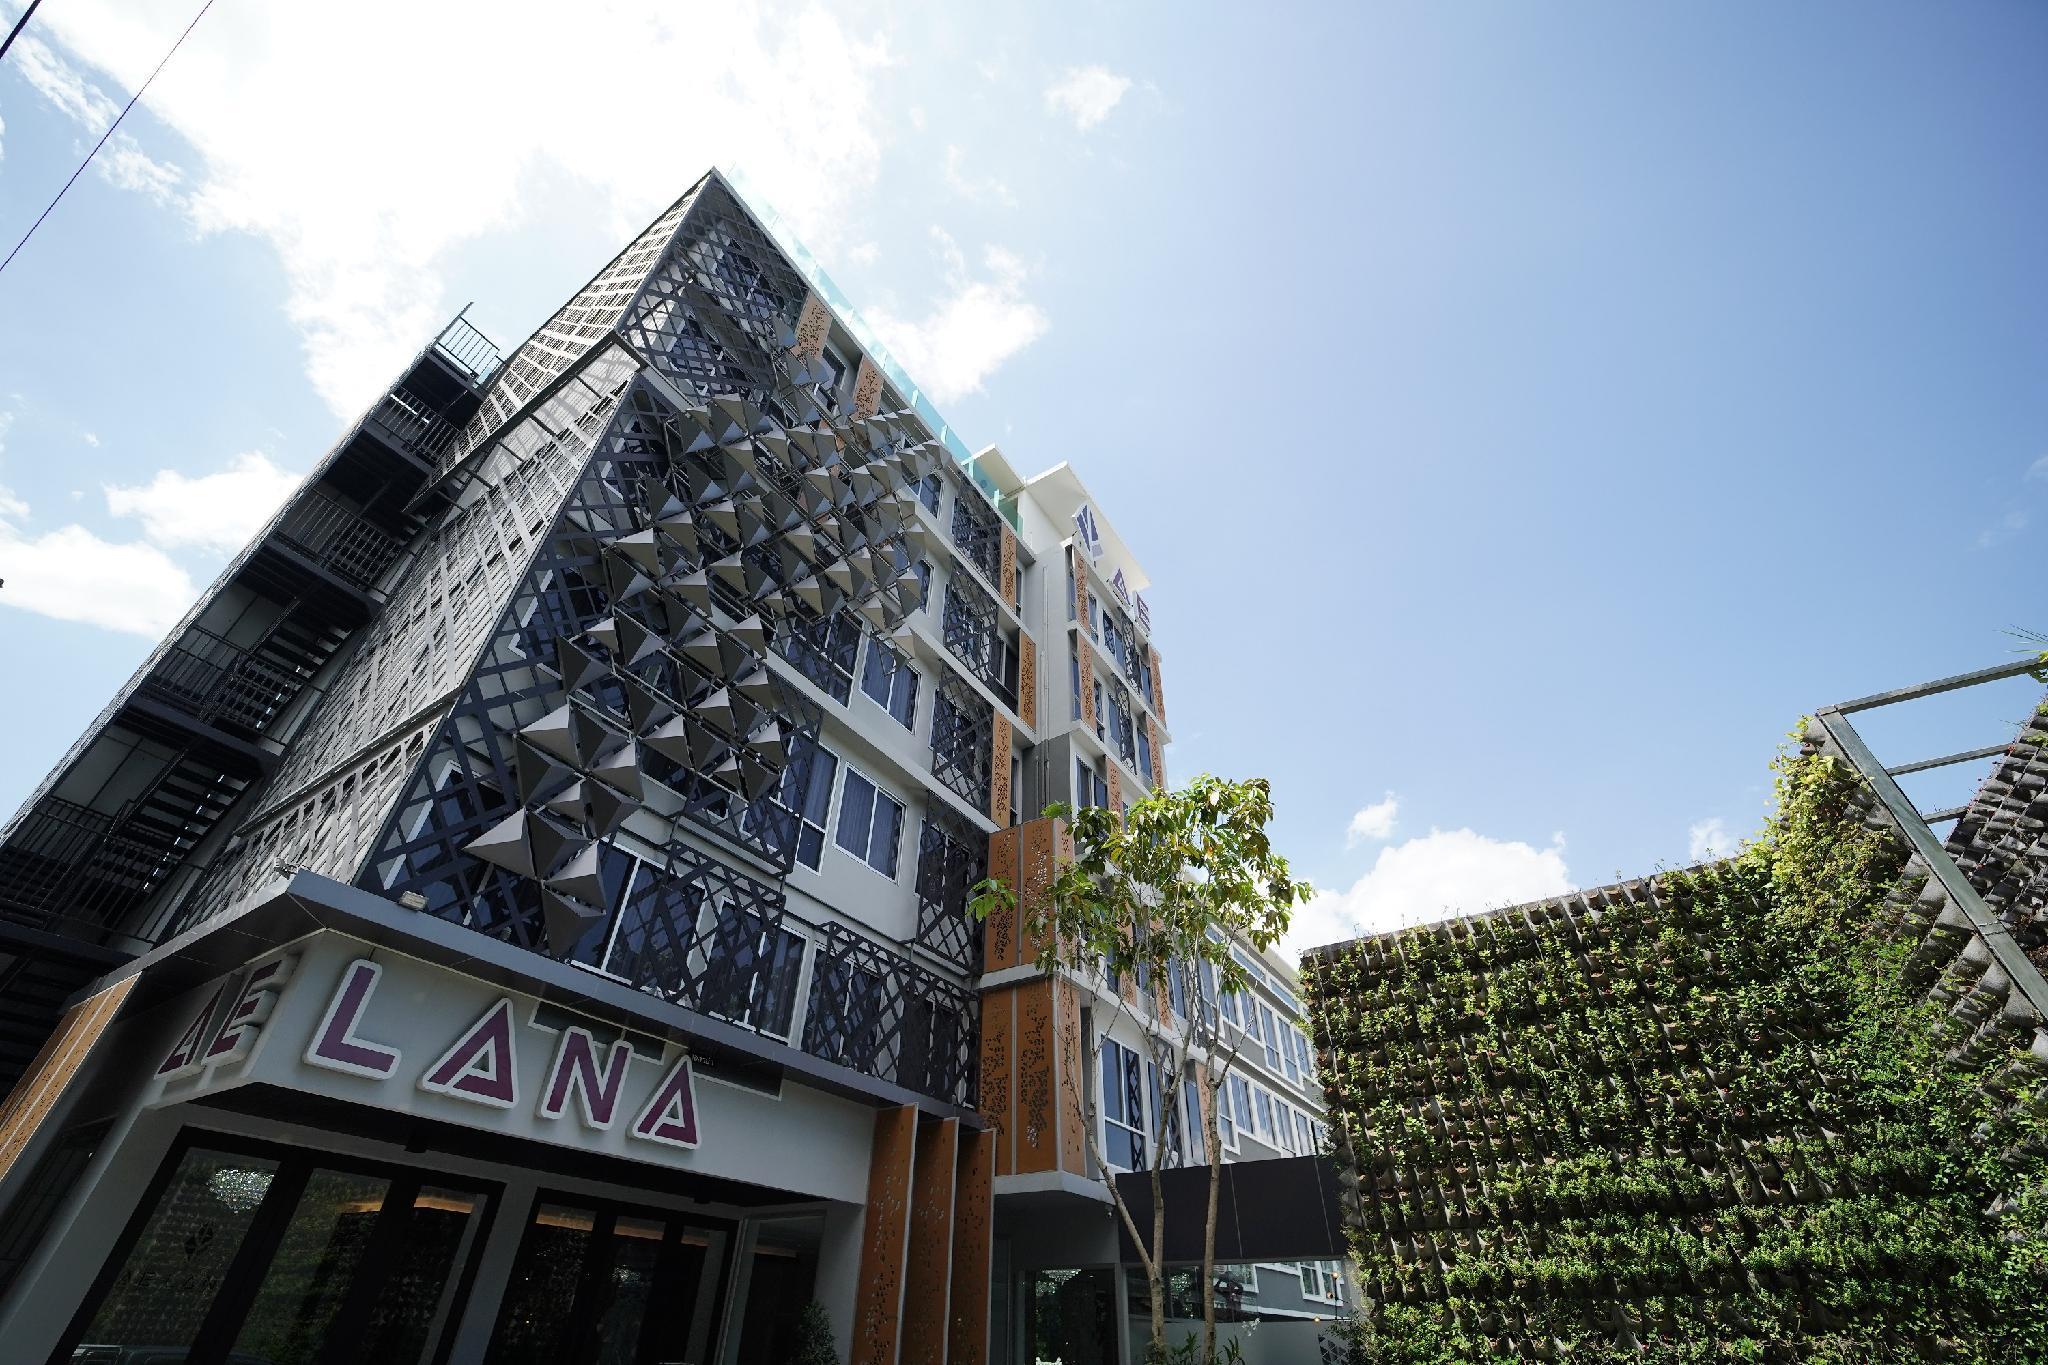 [CR] รีวิว โรงแรม เอลาน่า เชียงใหม่ (Ae Lana Chiangmai Hotel) [CR] Pantip